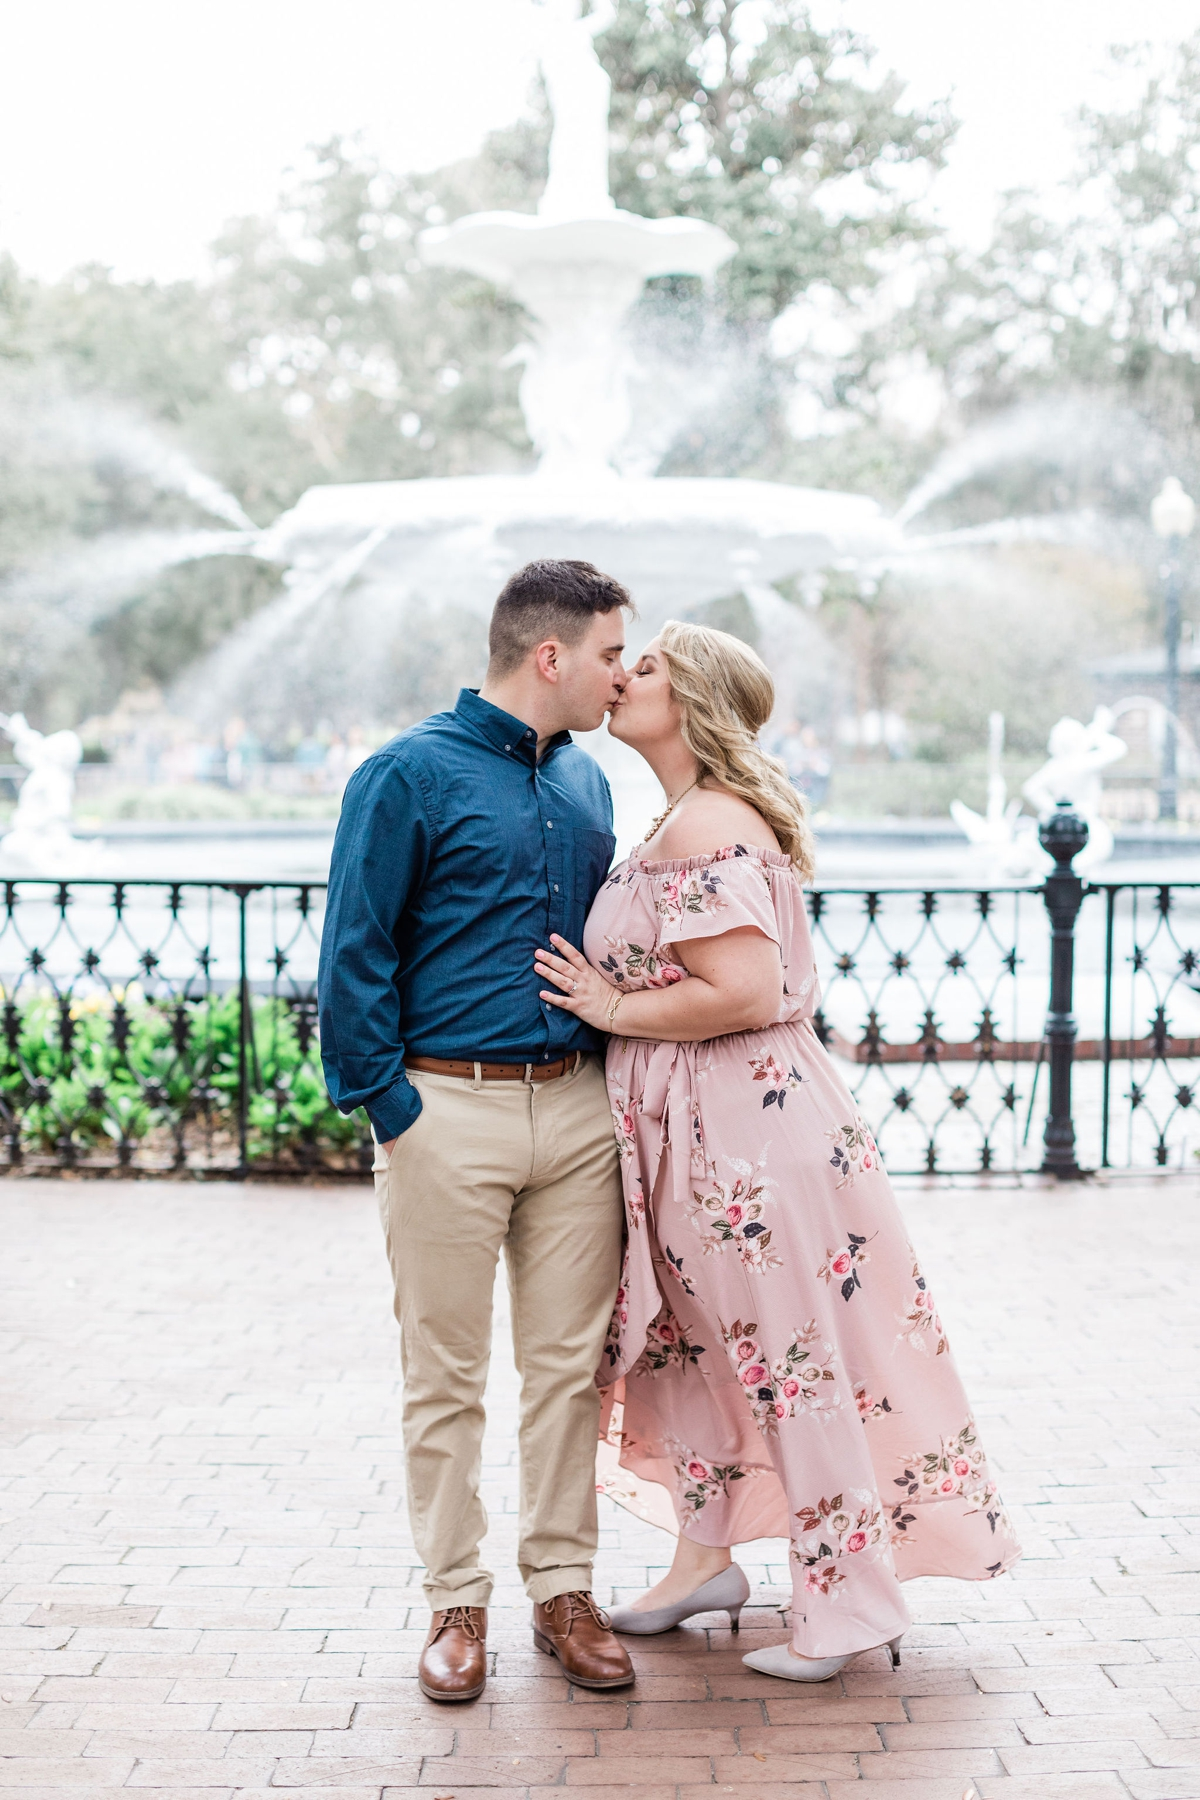 Alyssa and Carter's Savannah Downtown Engagement Session, blush floral dress   Apt B Photography